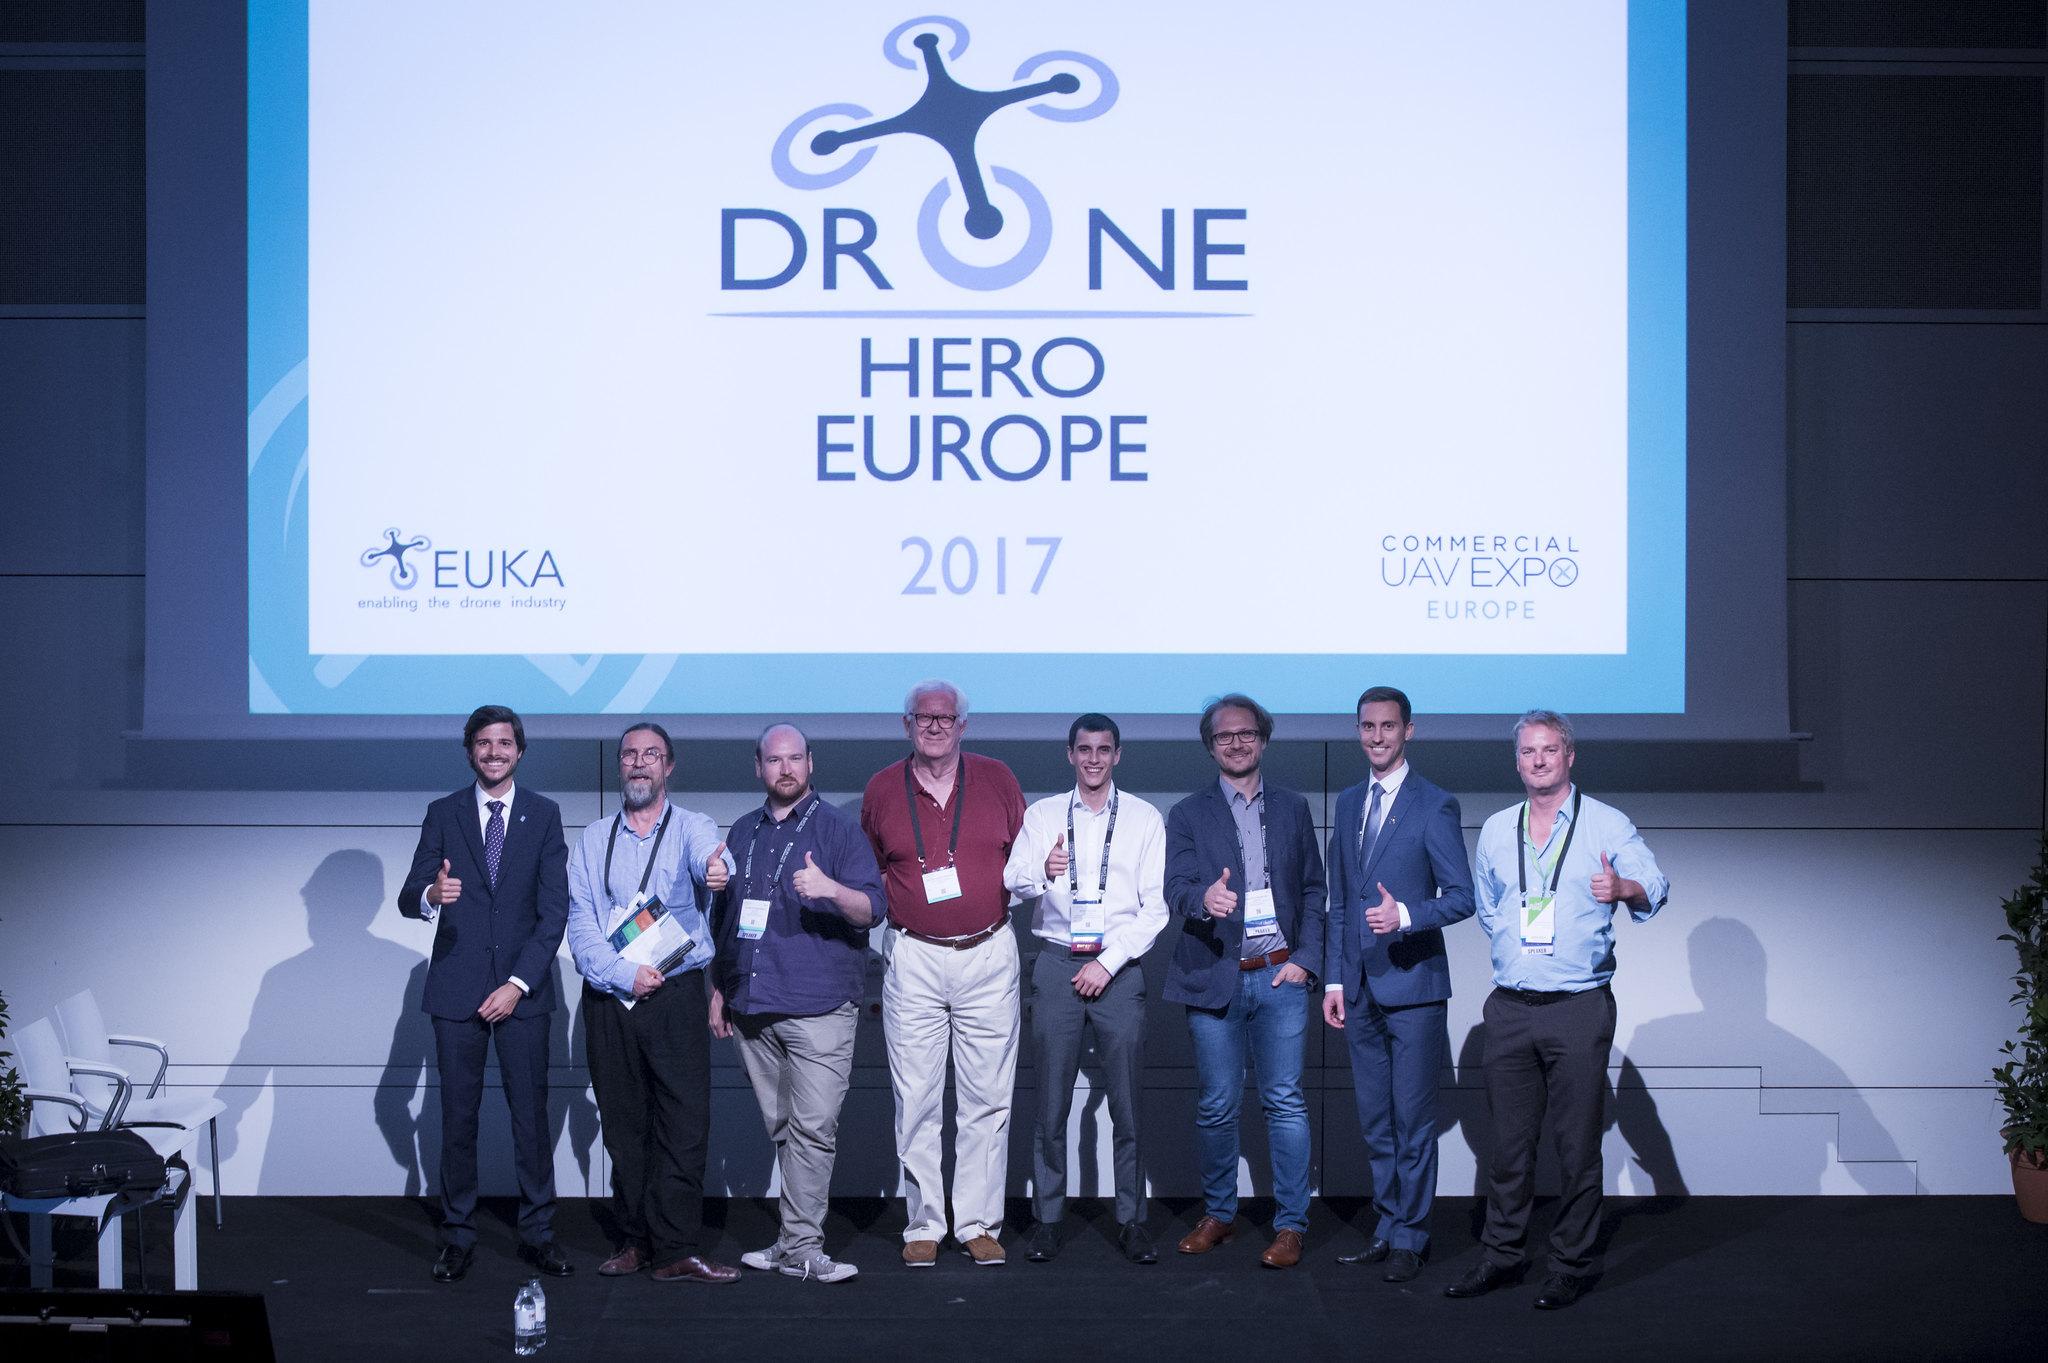 Drone Hero Europe 2017